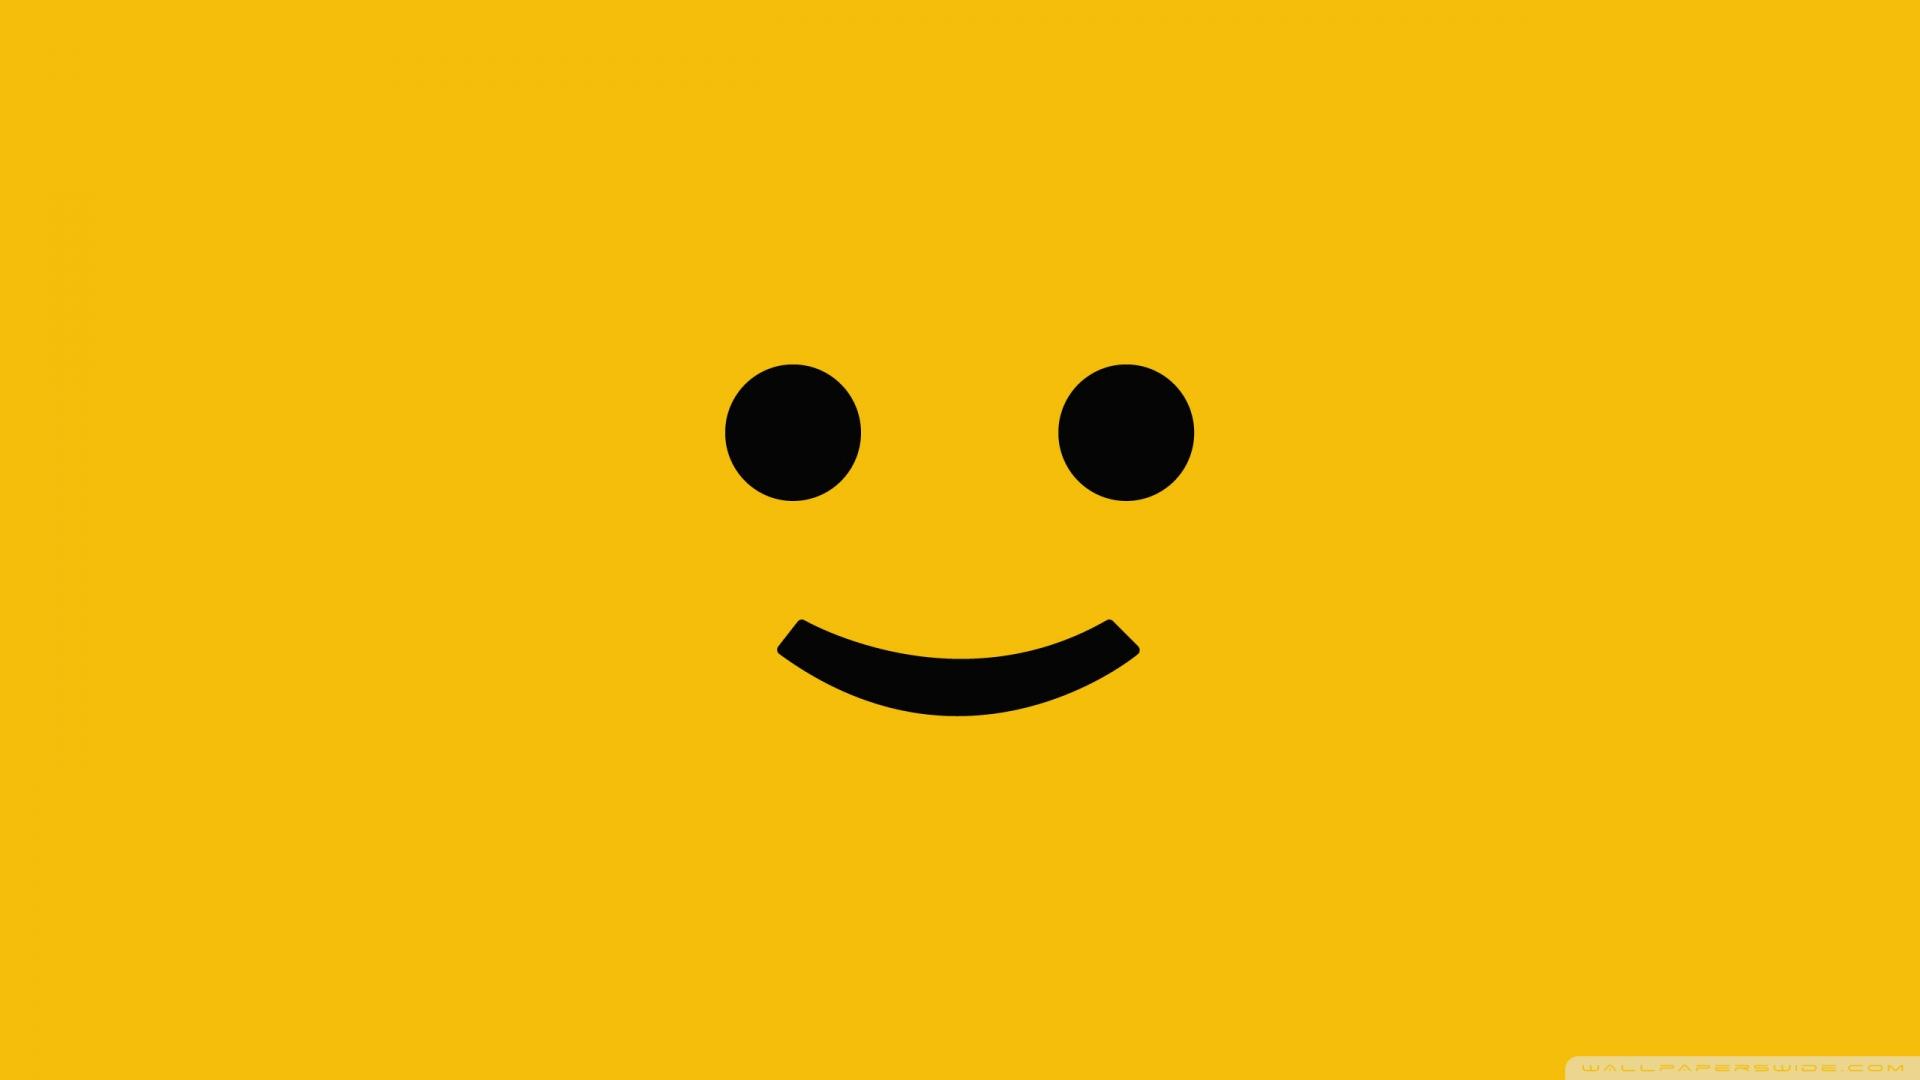 Smiley Face Movie Quotes QuotesGram 1920x1080